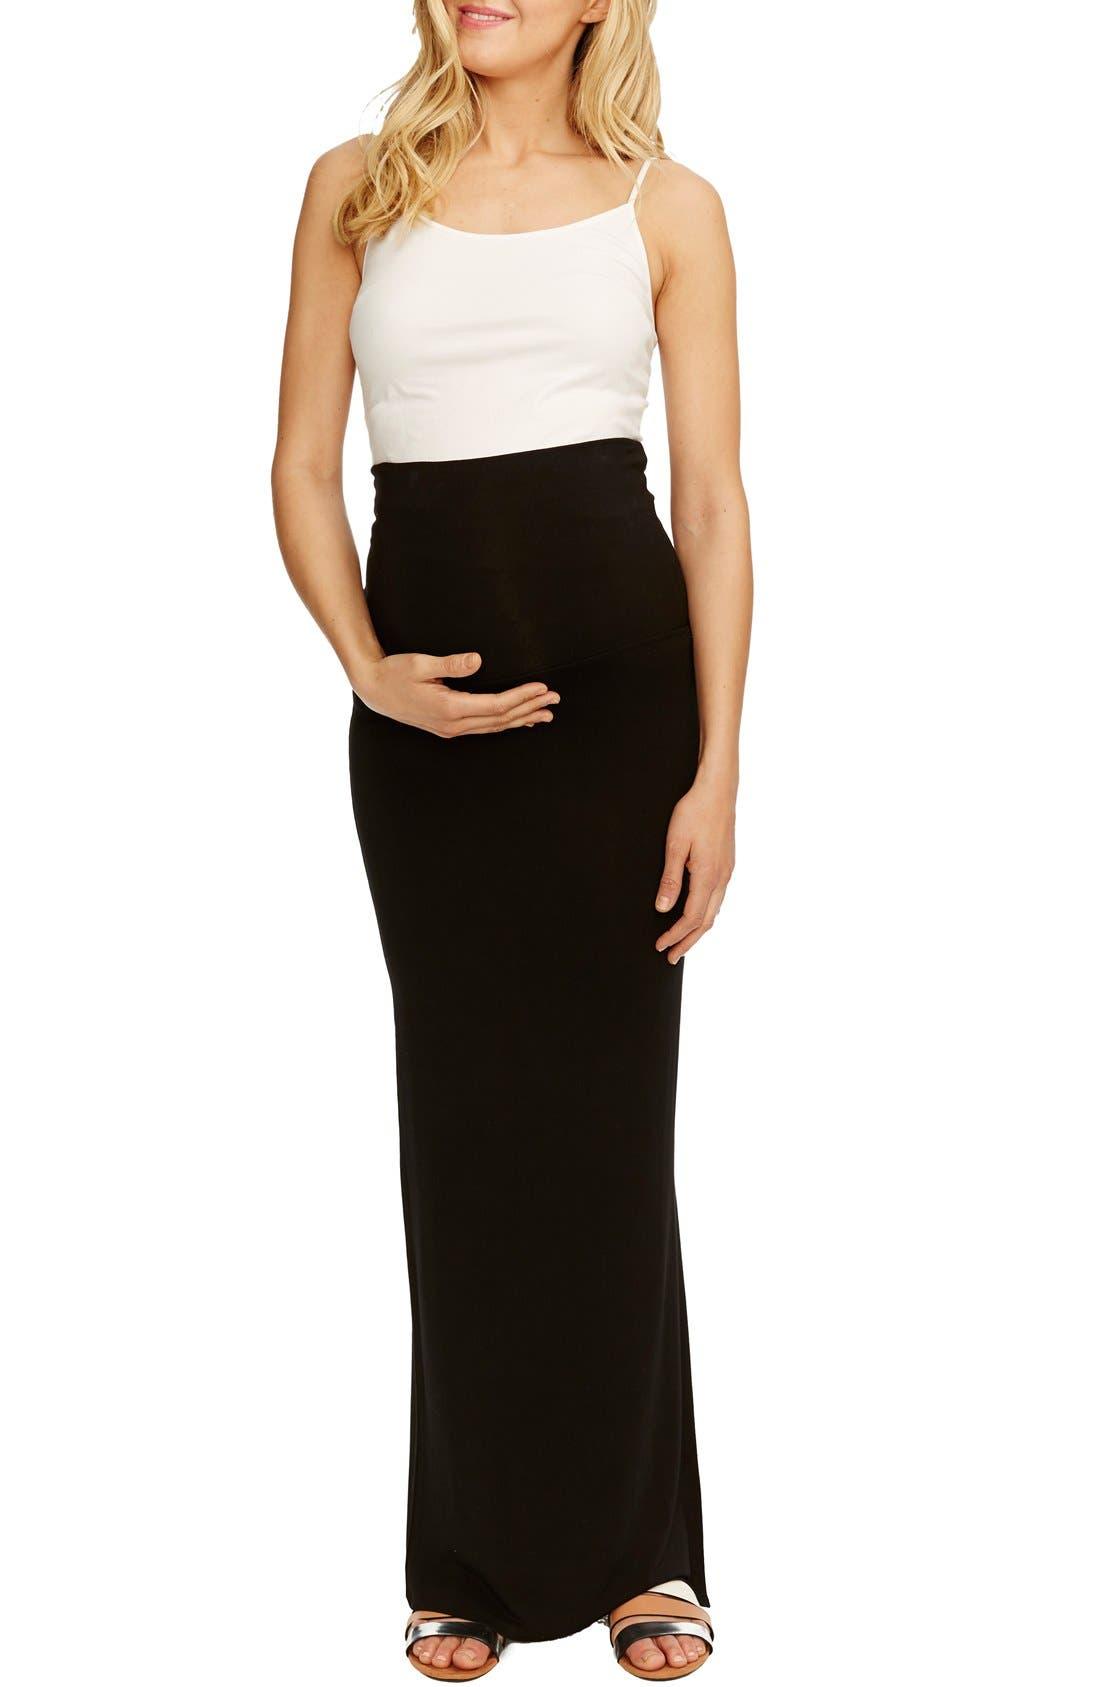 Rosie Pope 'Jessica' Maternity Maxi Skirt